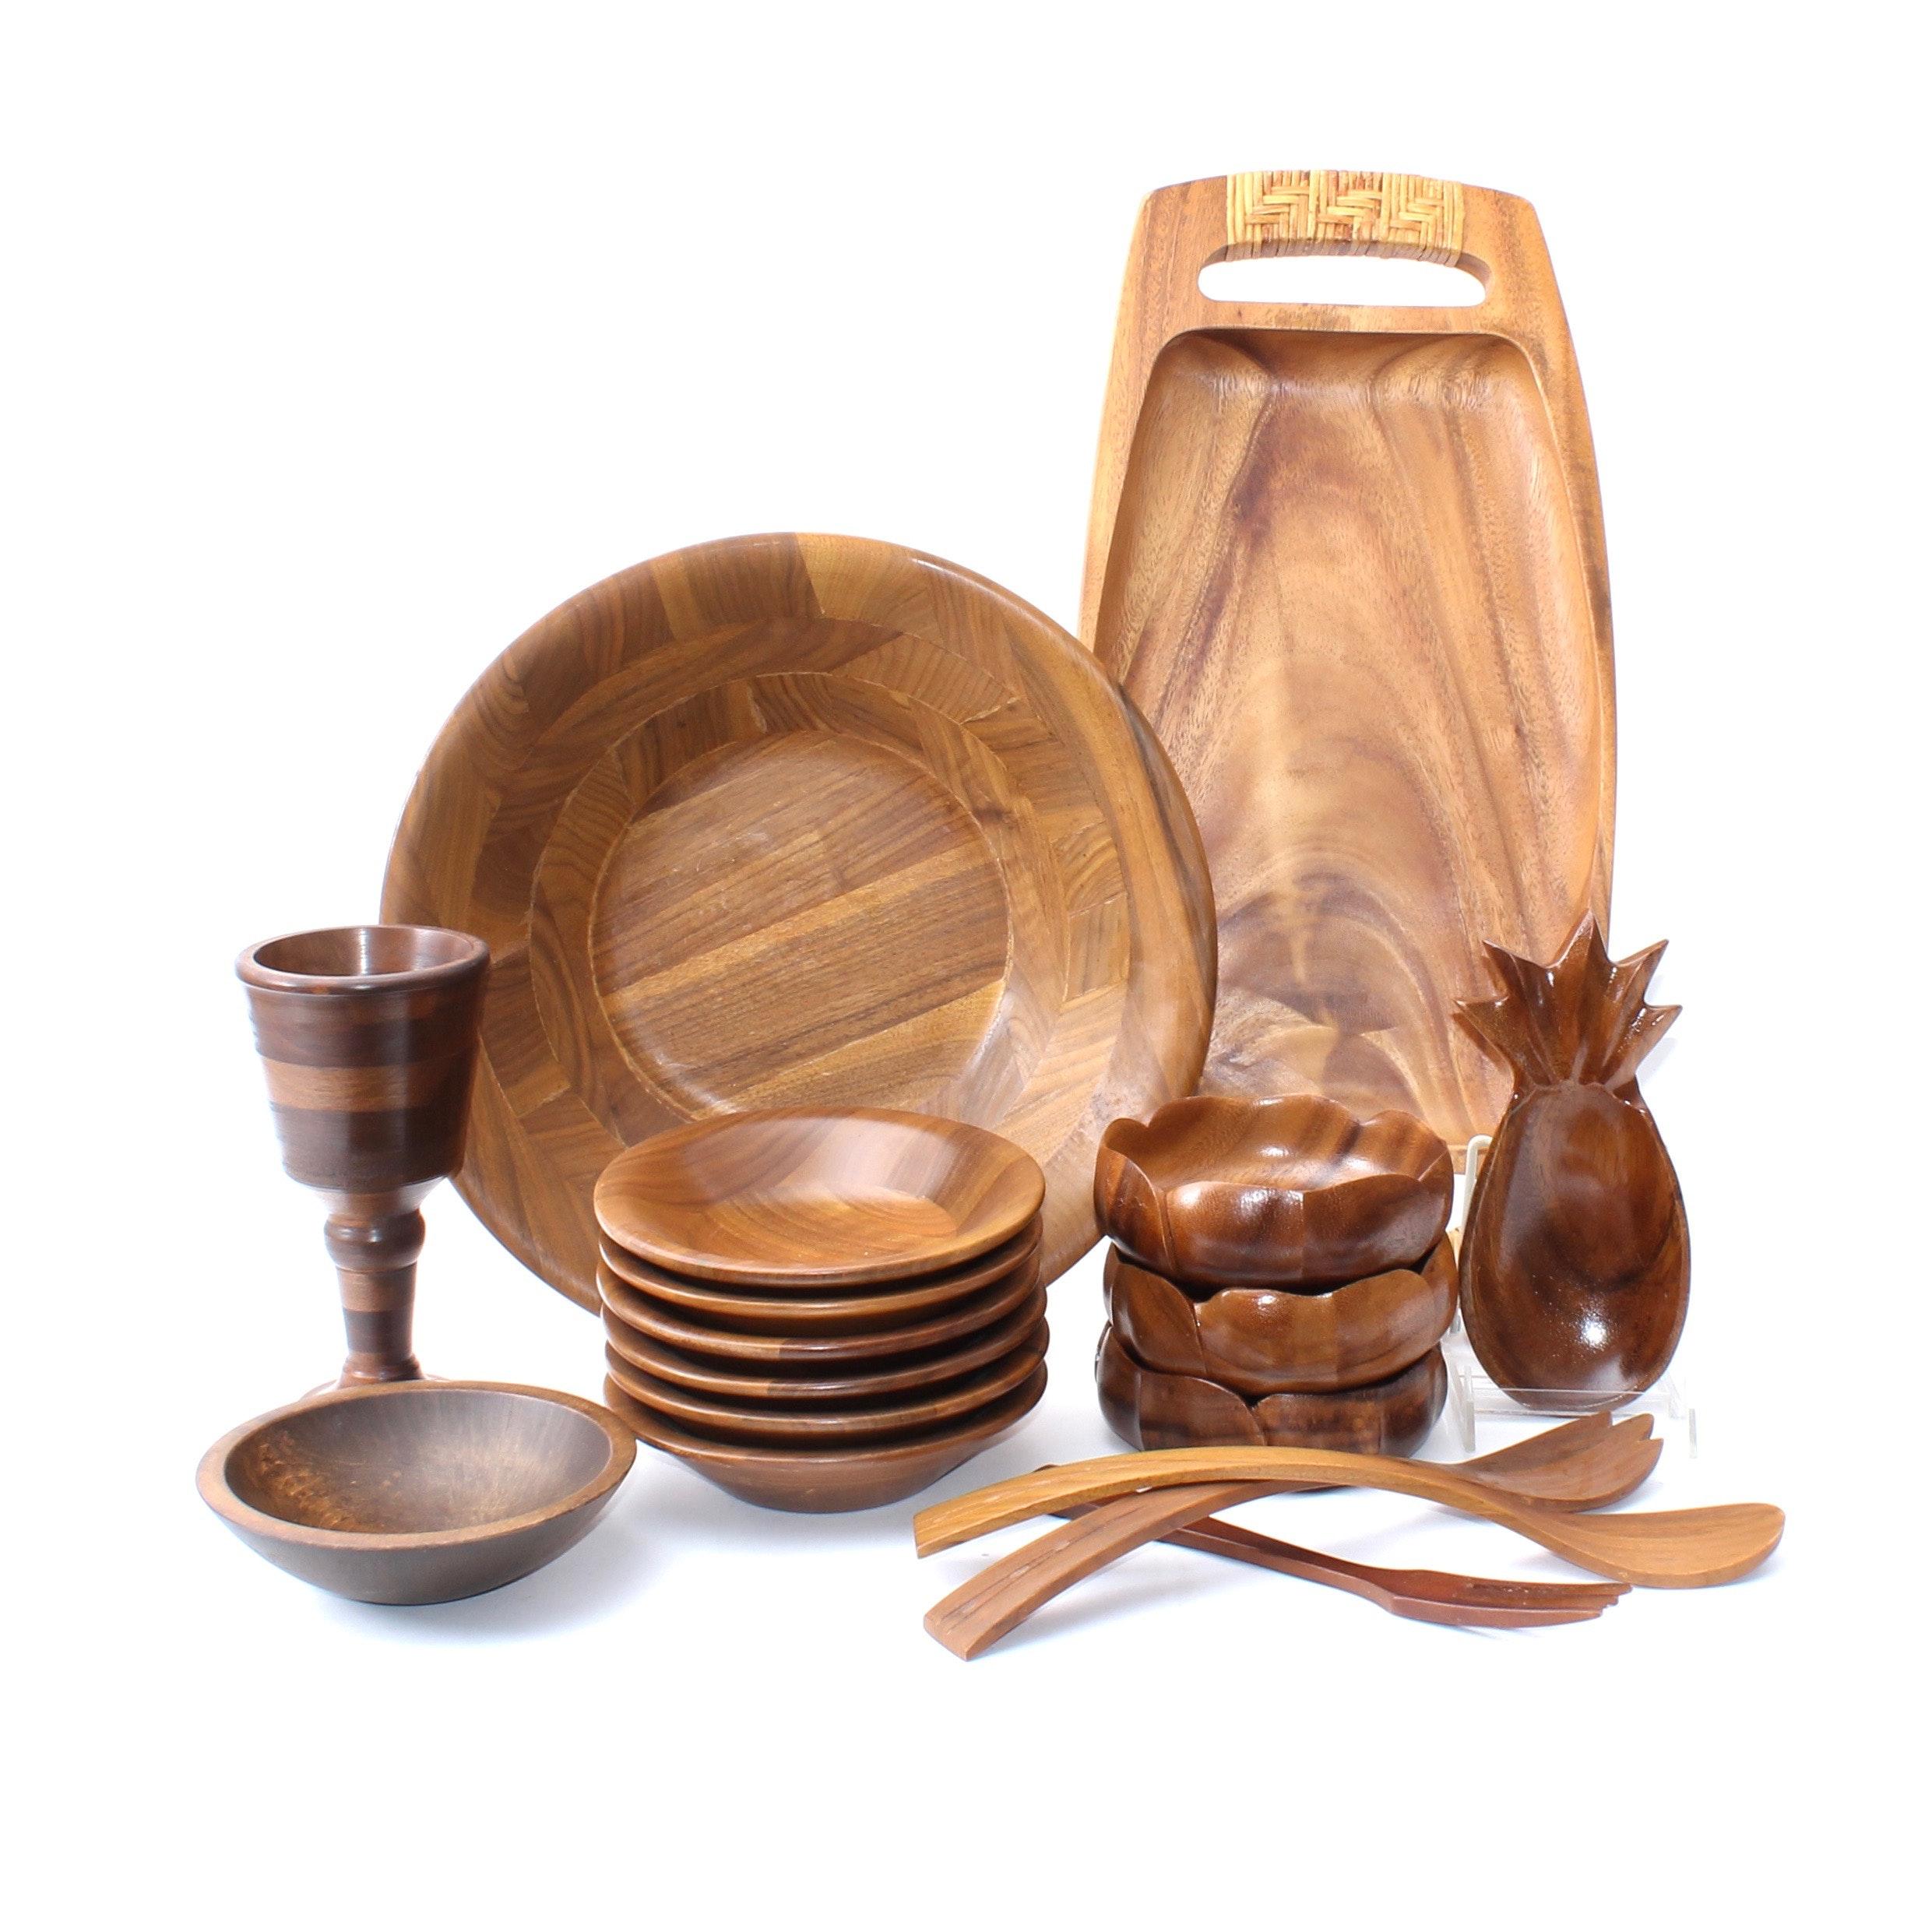 Fine Woodware Selection Inlcuding Acacia Monkey Pod and Walnut Salad Set